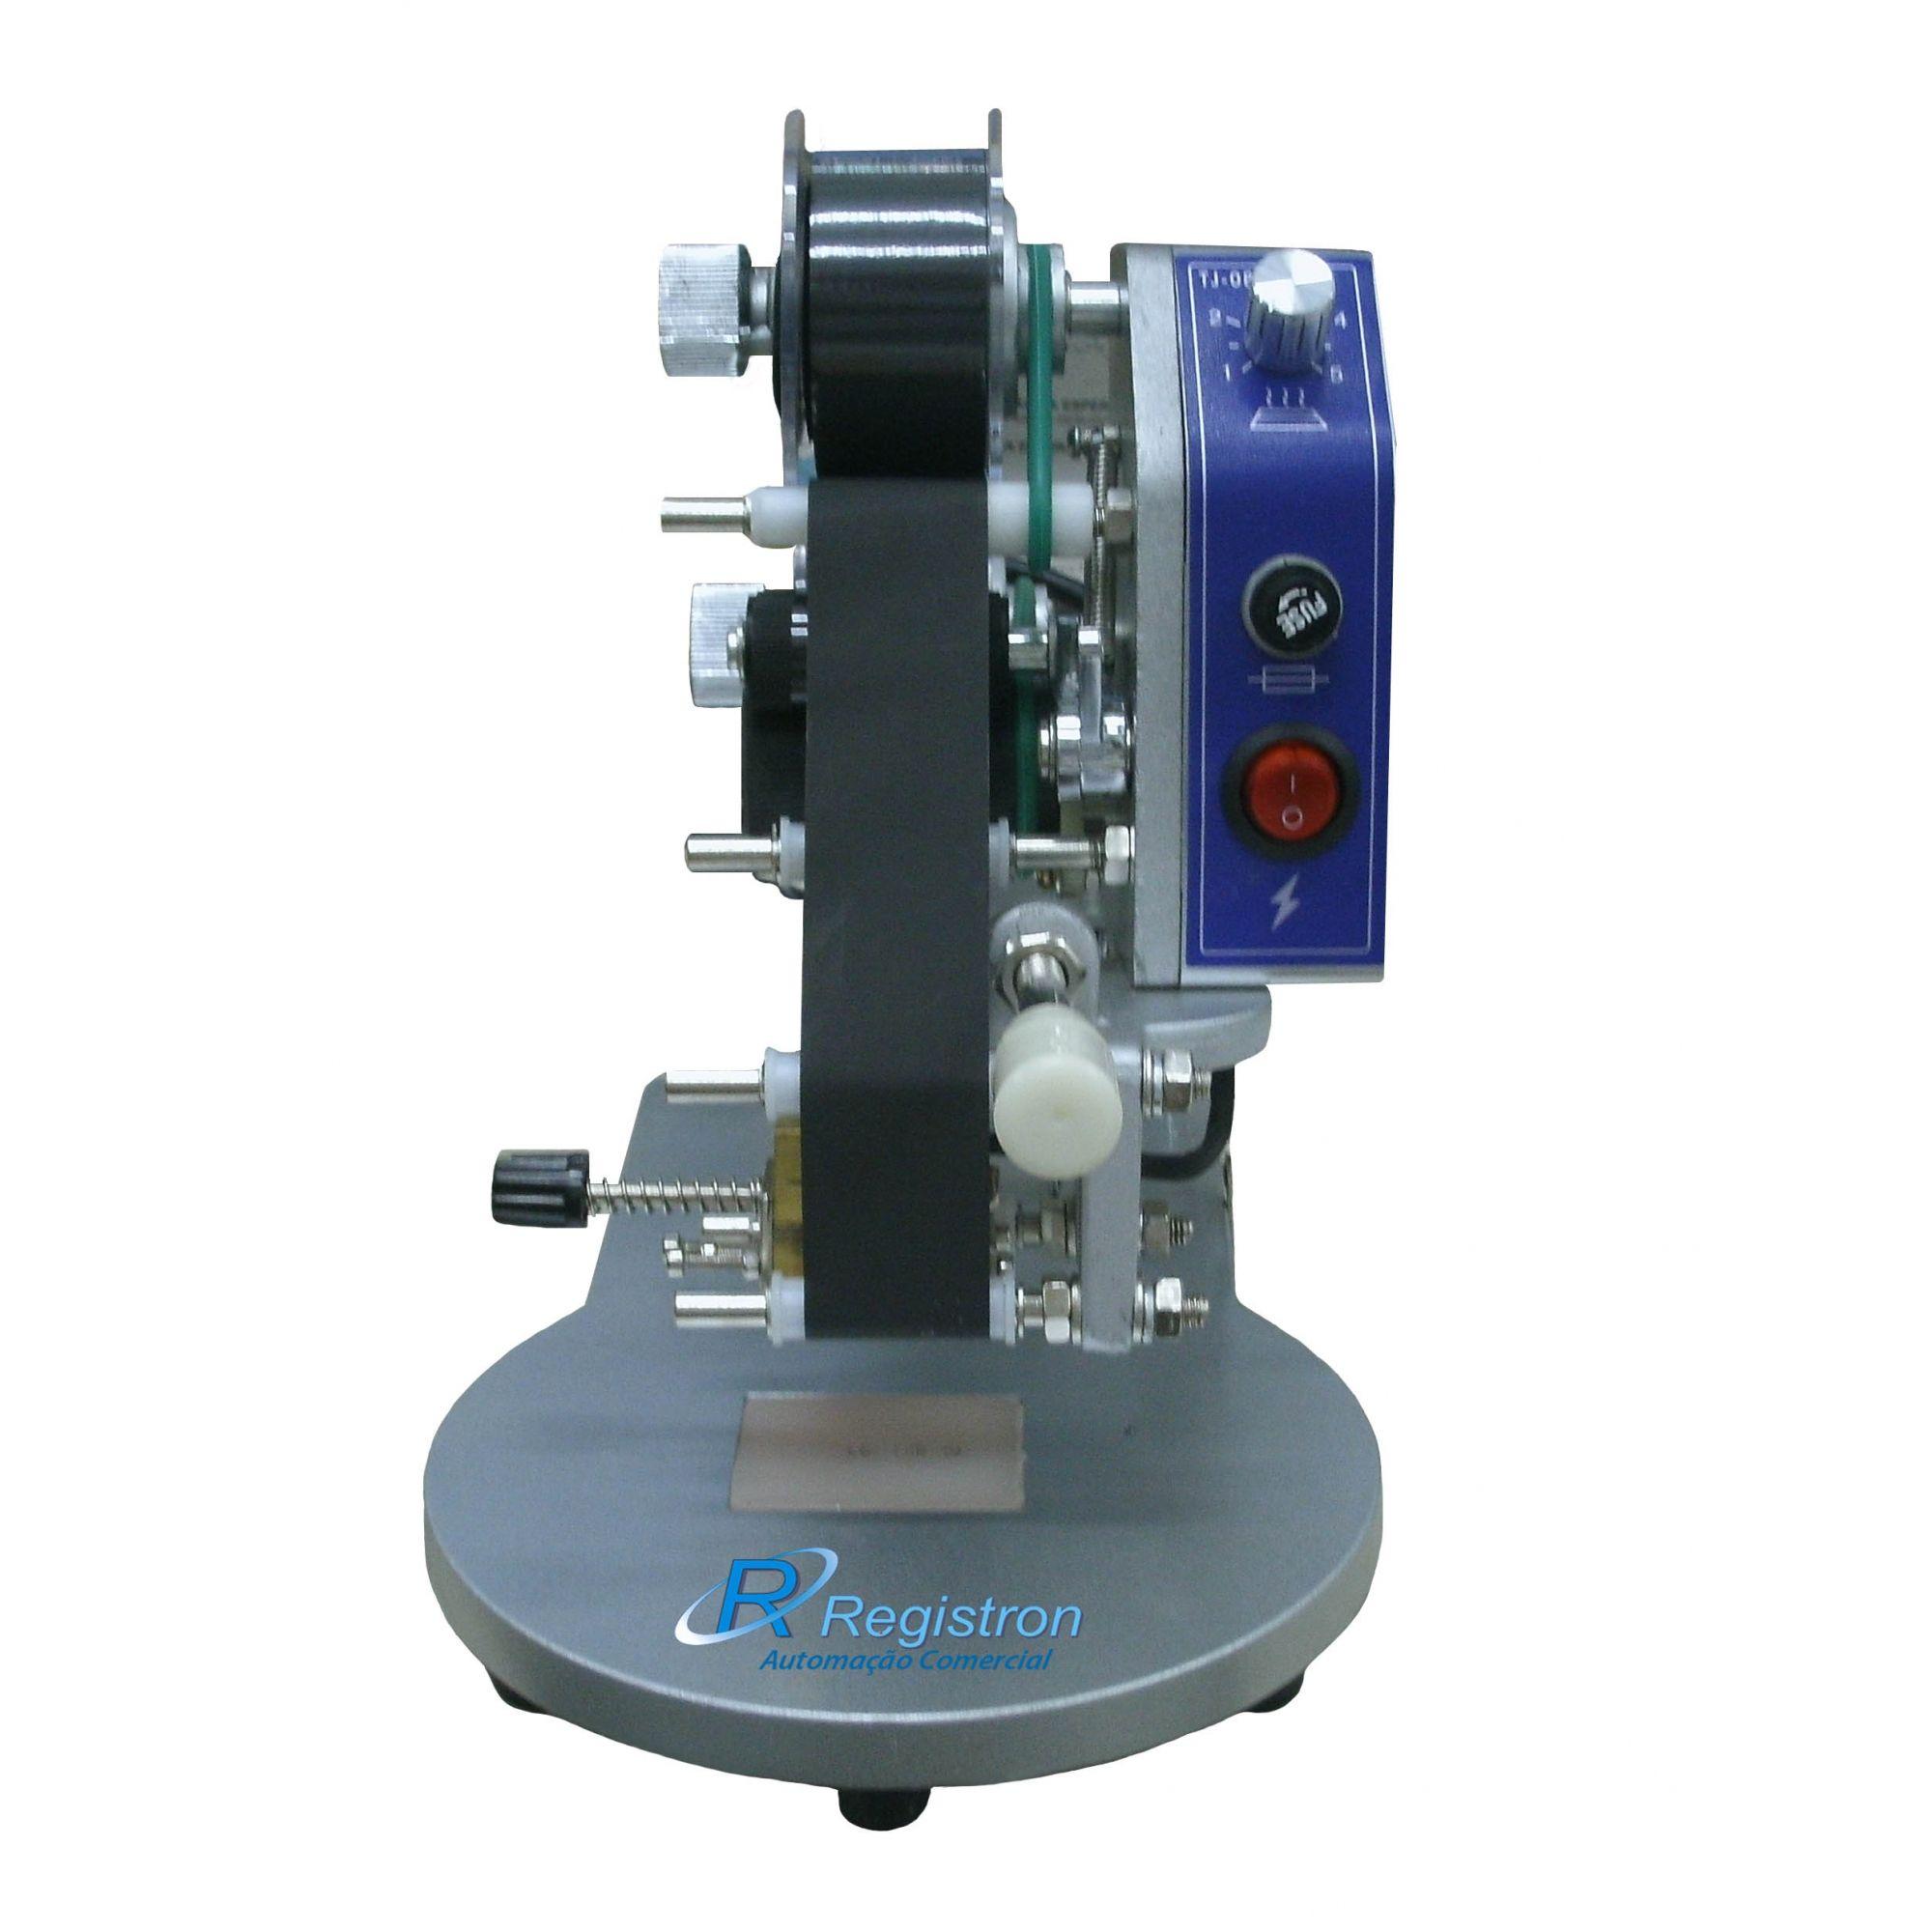 Datador de Embalagem Manual RG-DY8B - 220V